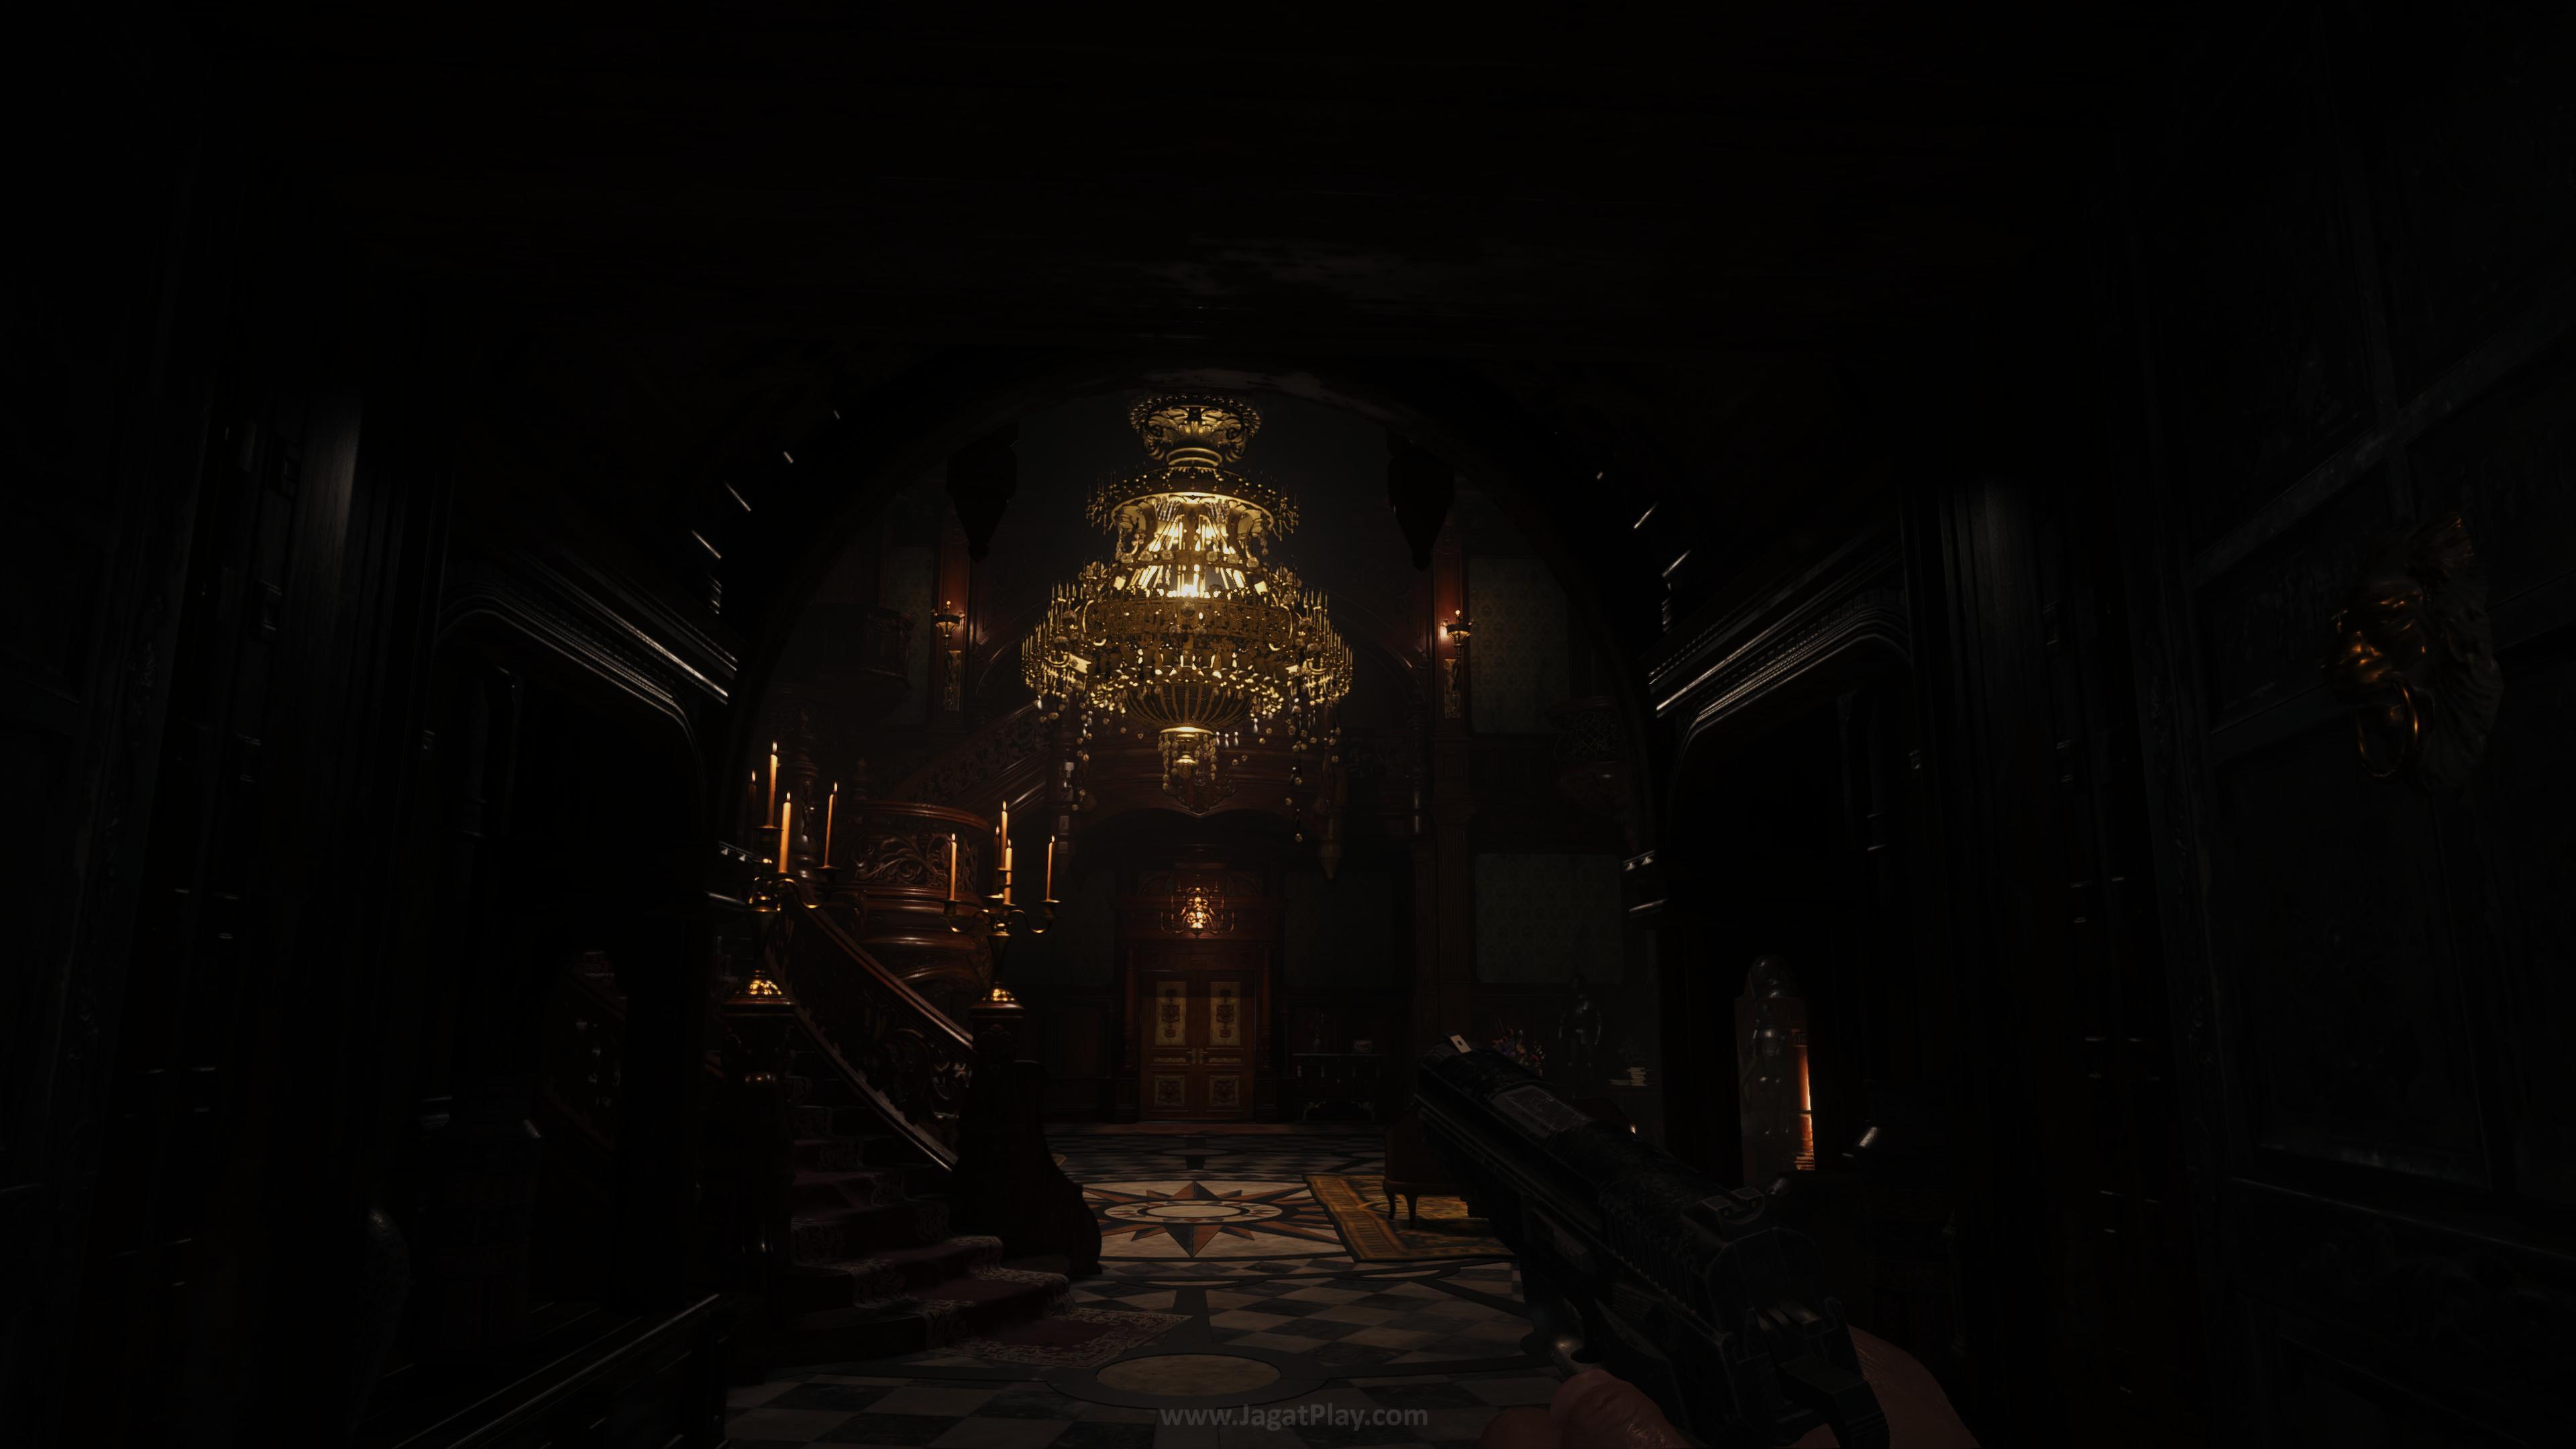 Resident Evil Village jagatplay part 1 61